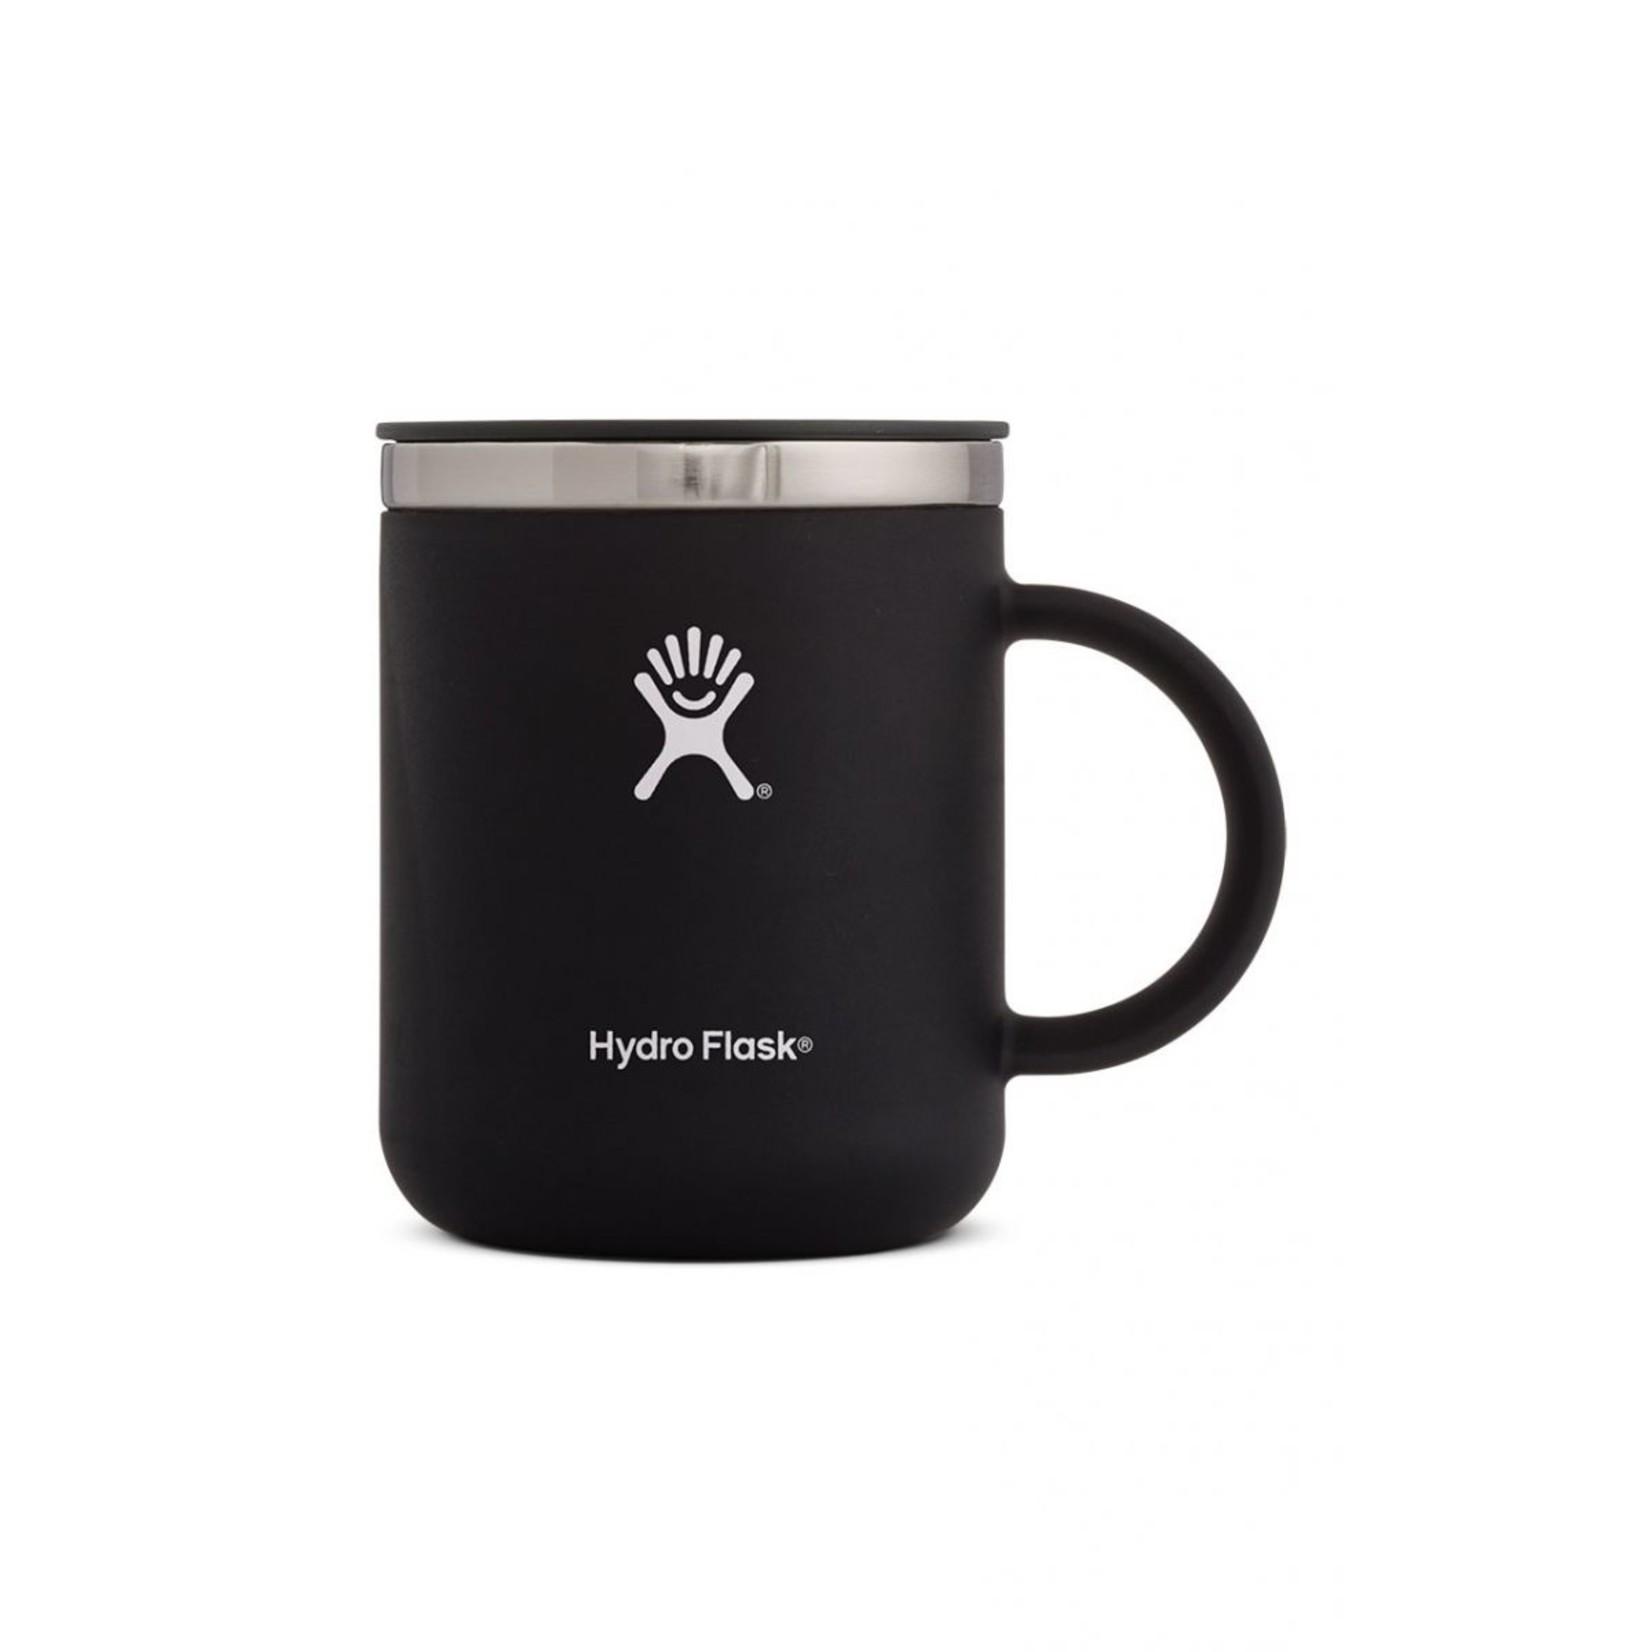 Hydro Flask Hydro Flask 12oz Tumbler Coffee Mug.